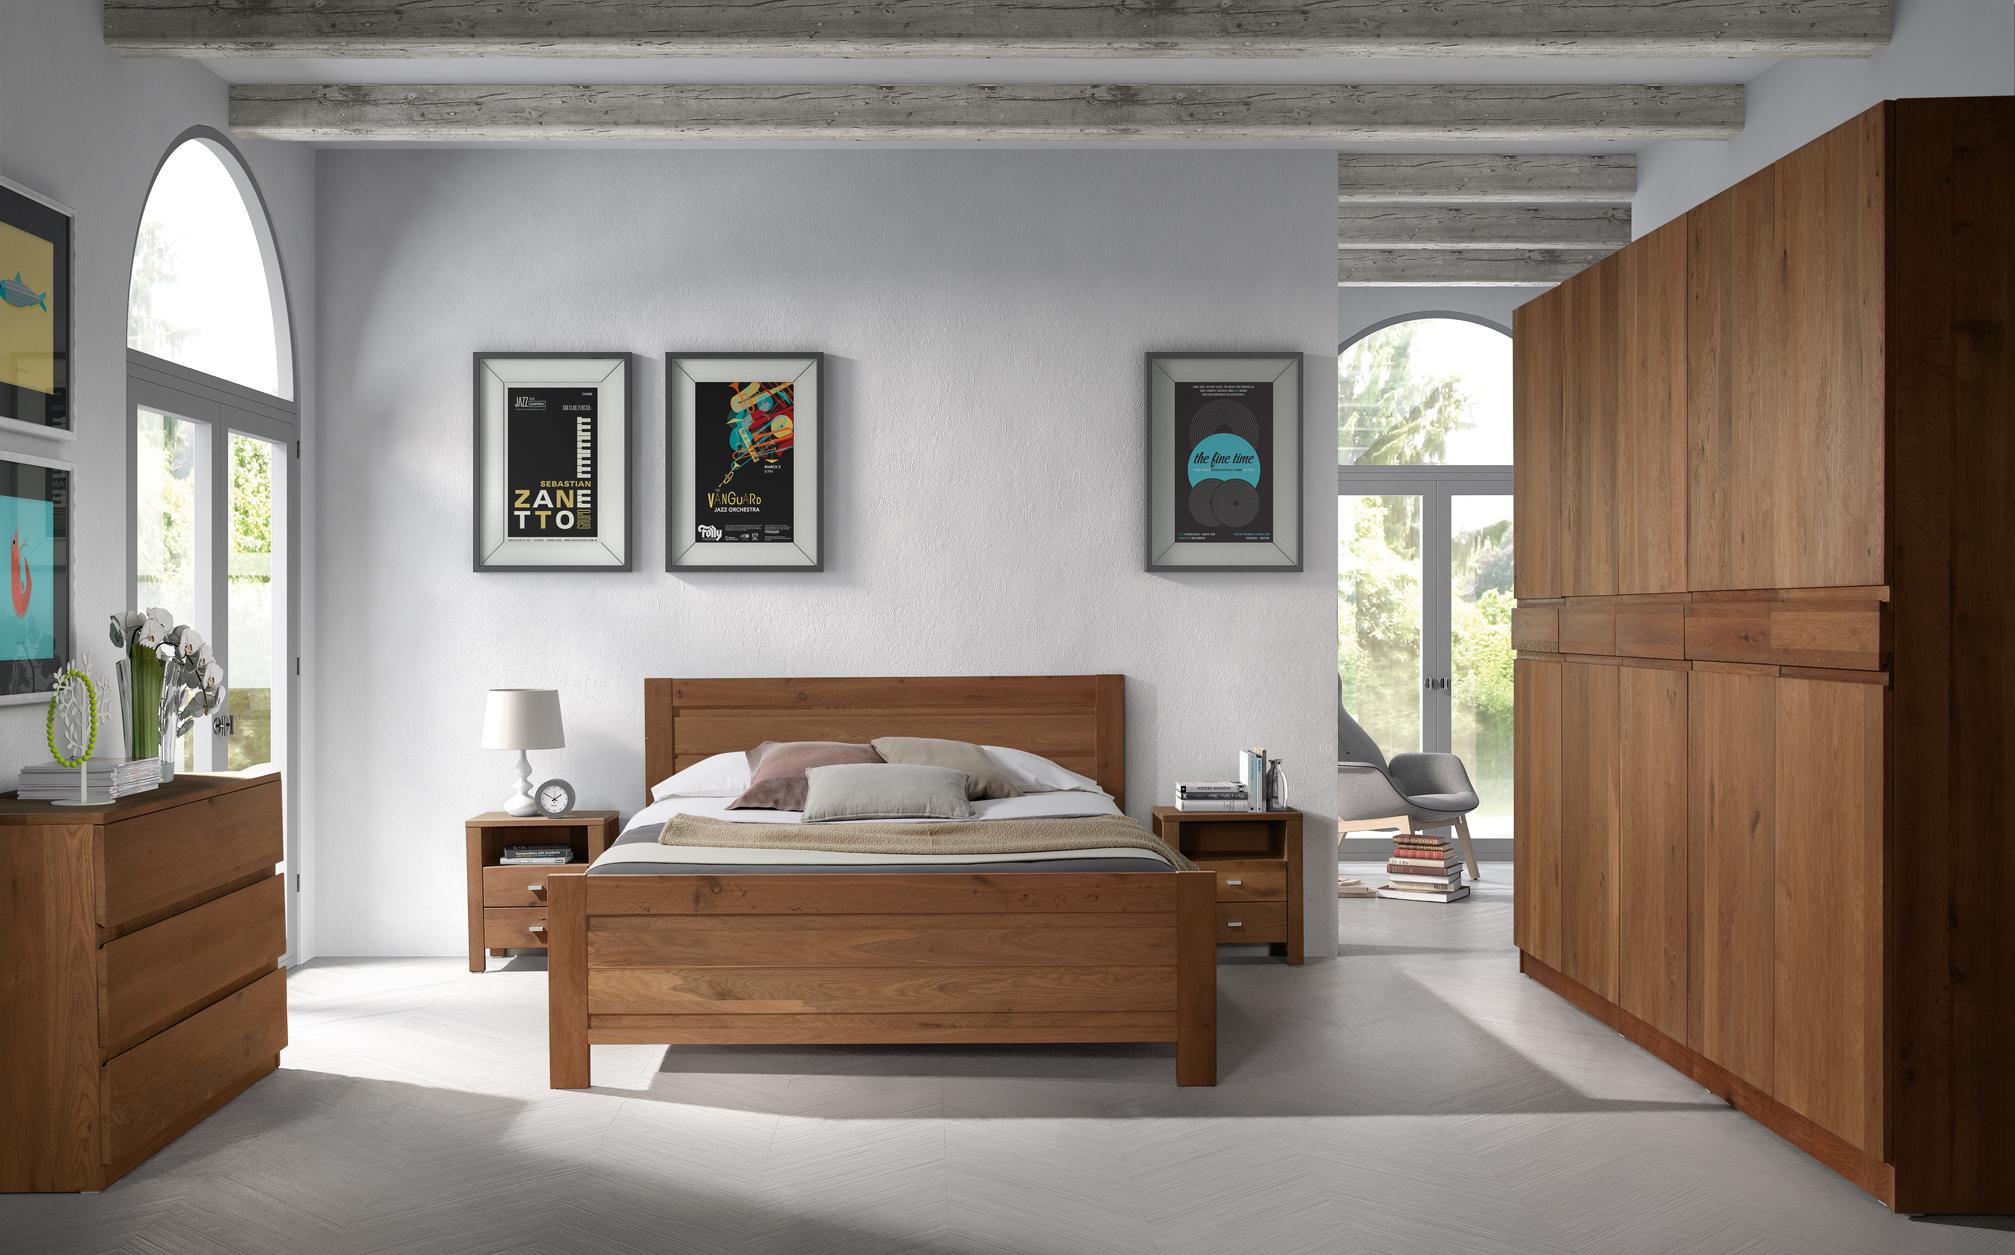 Slaapkamer Stemio - Collectie | kasten tafels bedden fauteuils ...